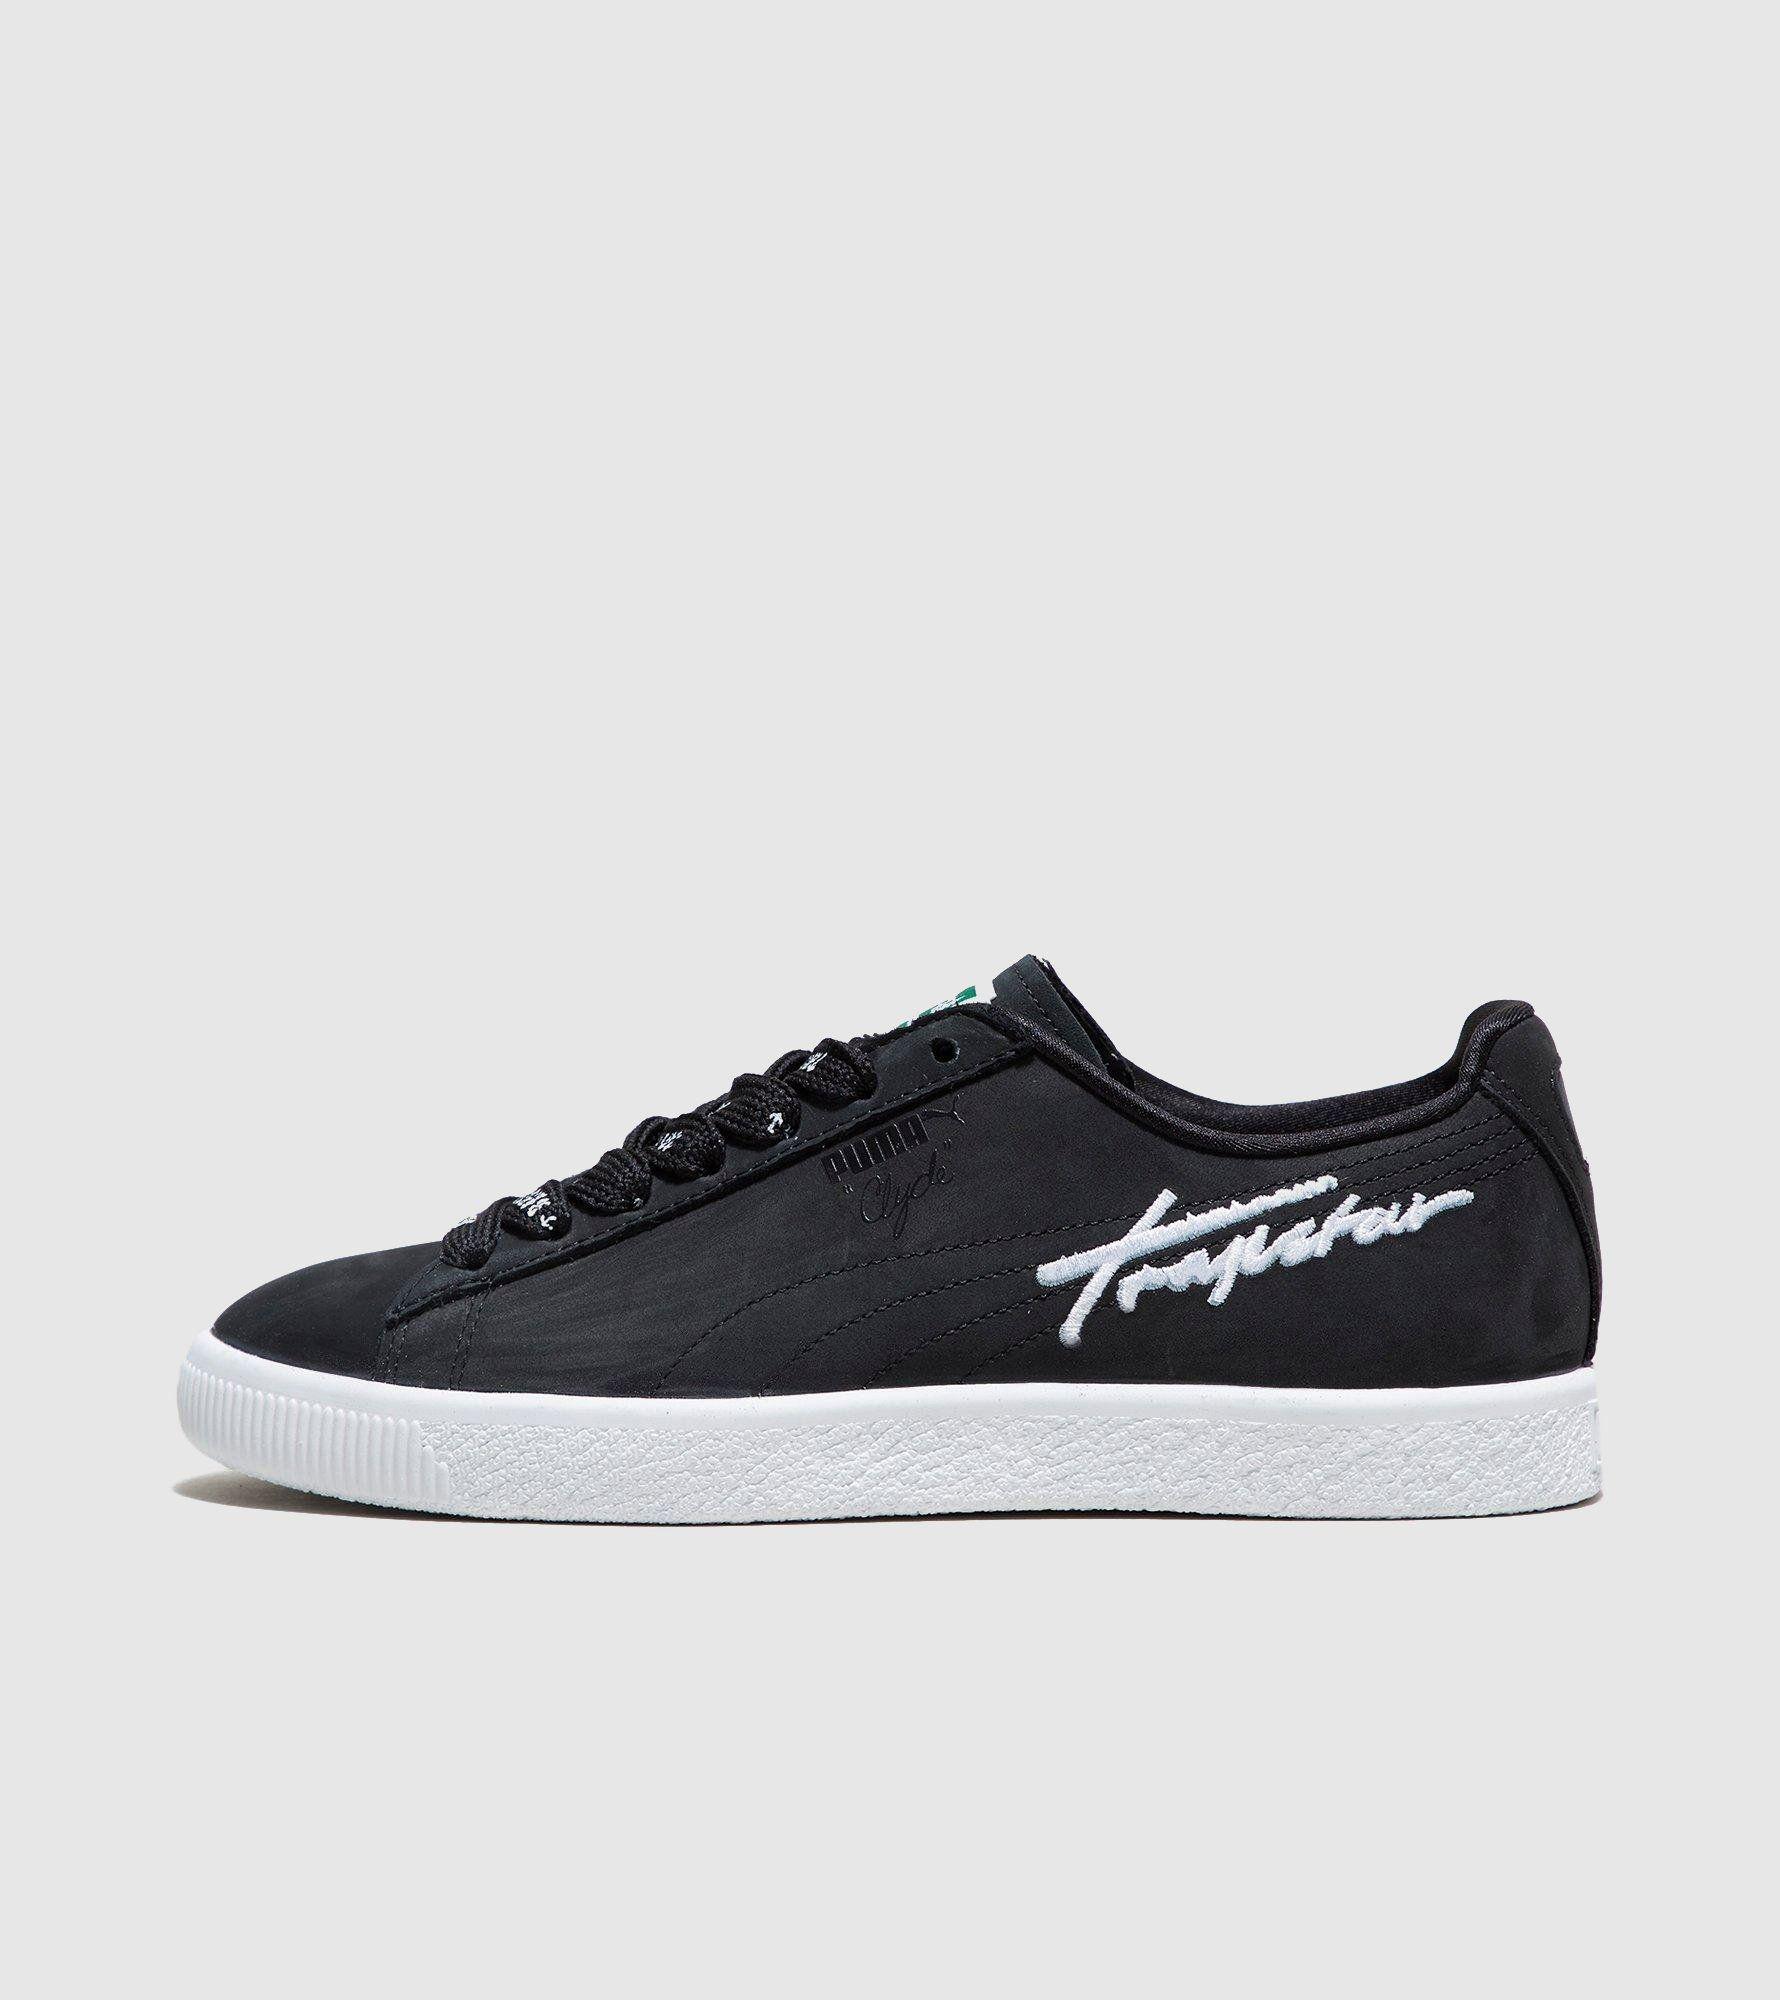 buy online d9fa8 20d9a ... puma trinomic flyknit black grey ...